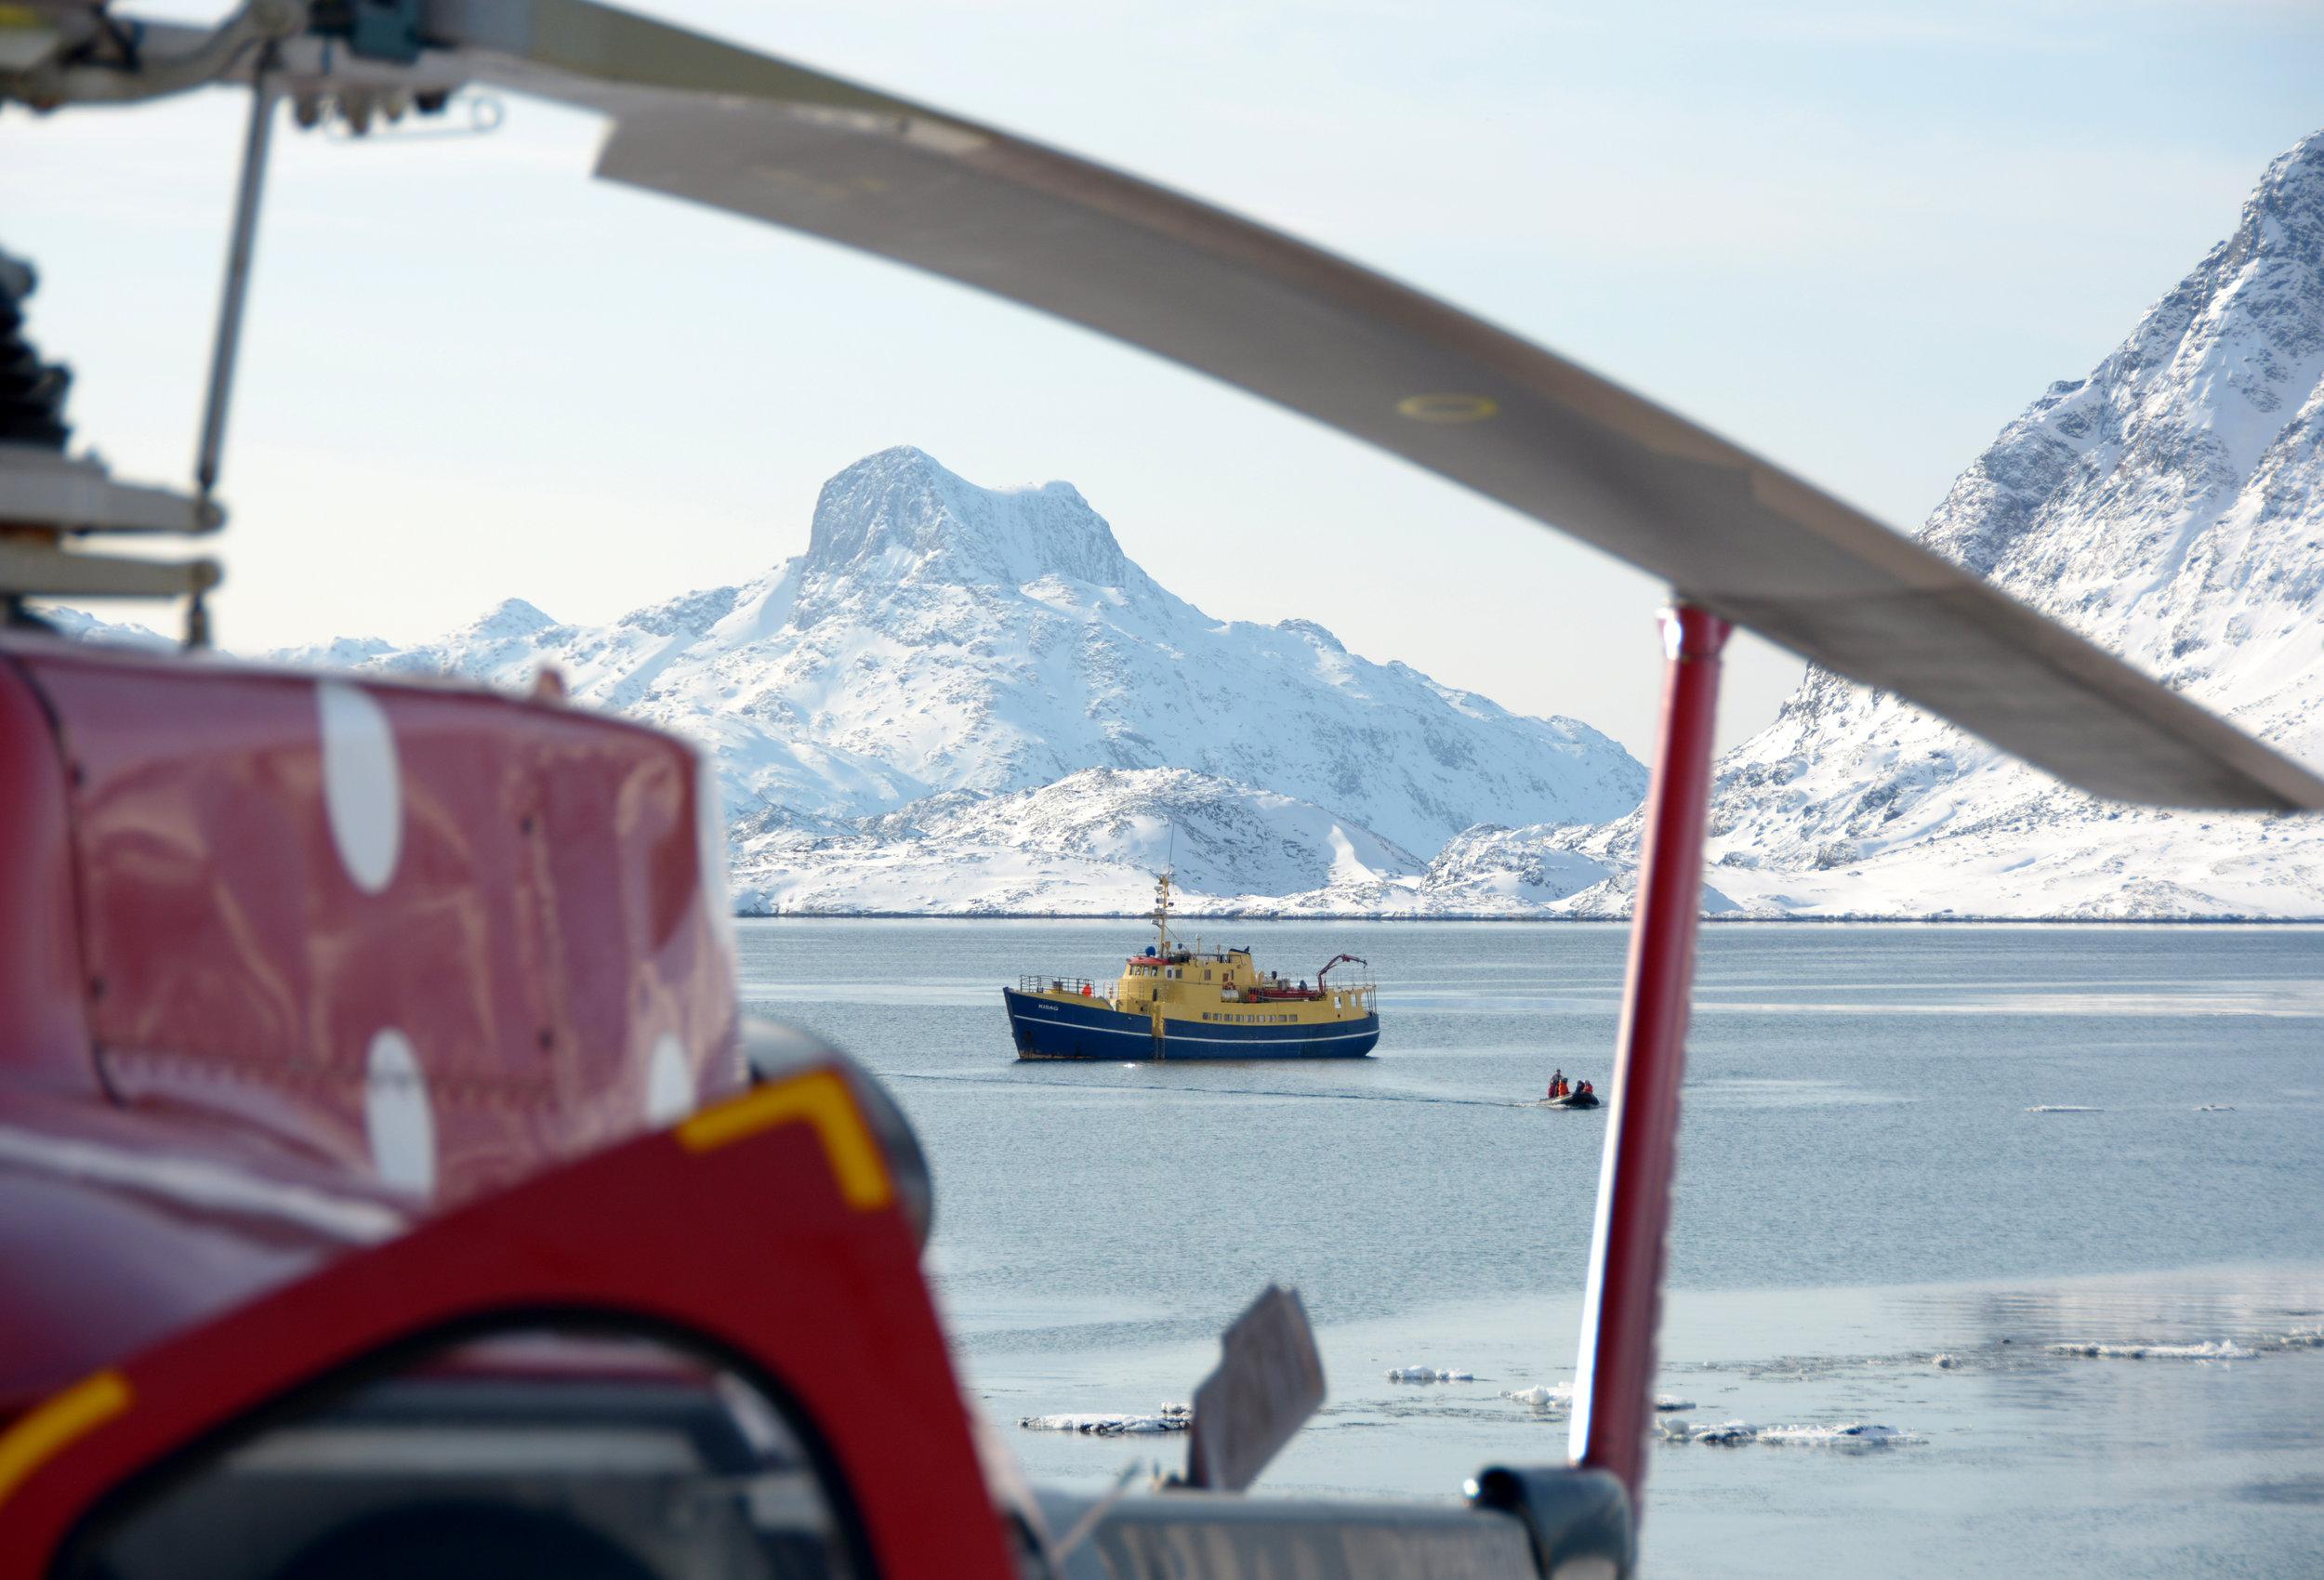 Powderbird-Greenland-Gallery-Images-Ship-Kisaq21.jpg